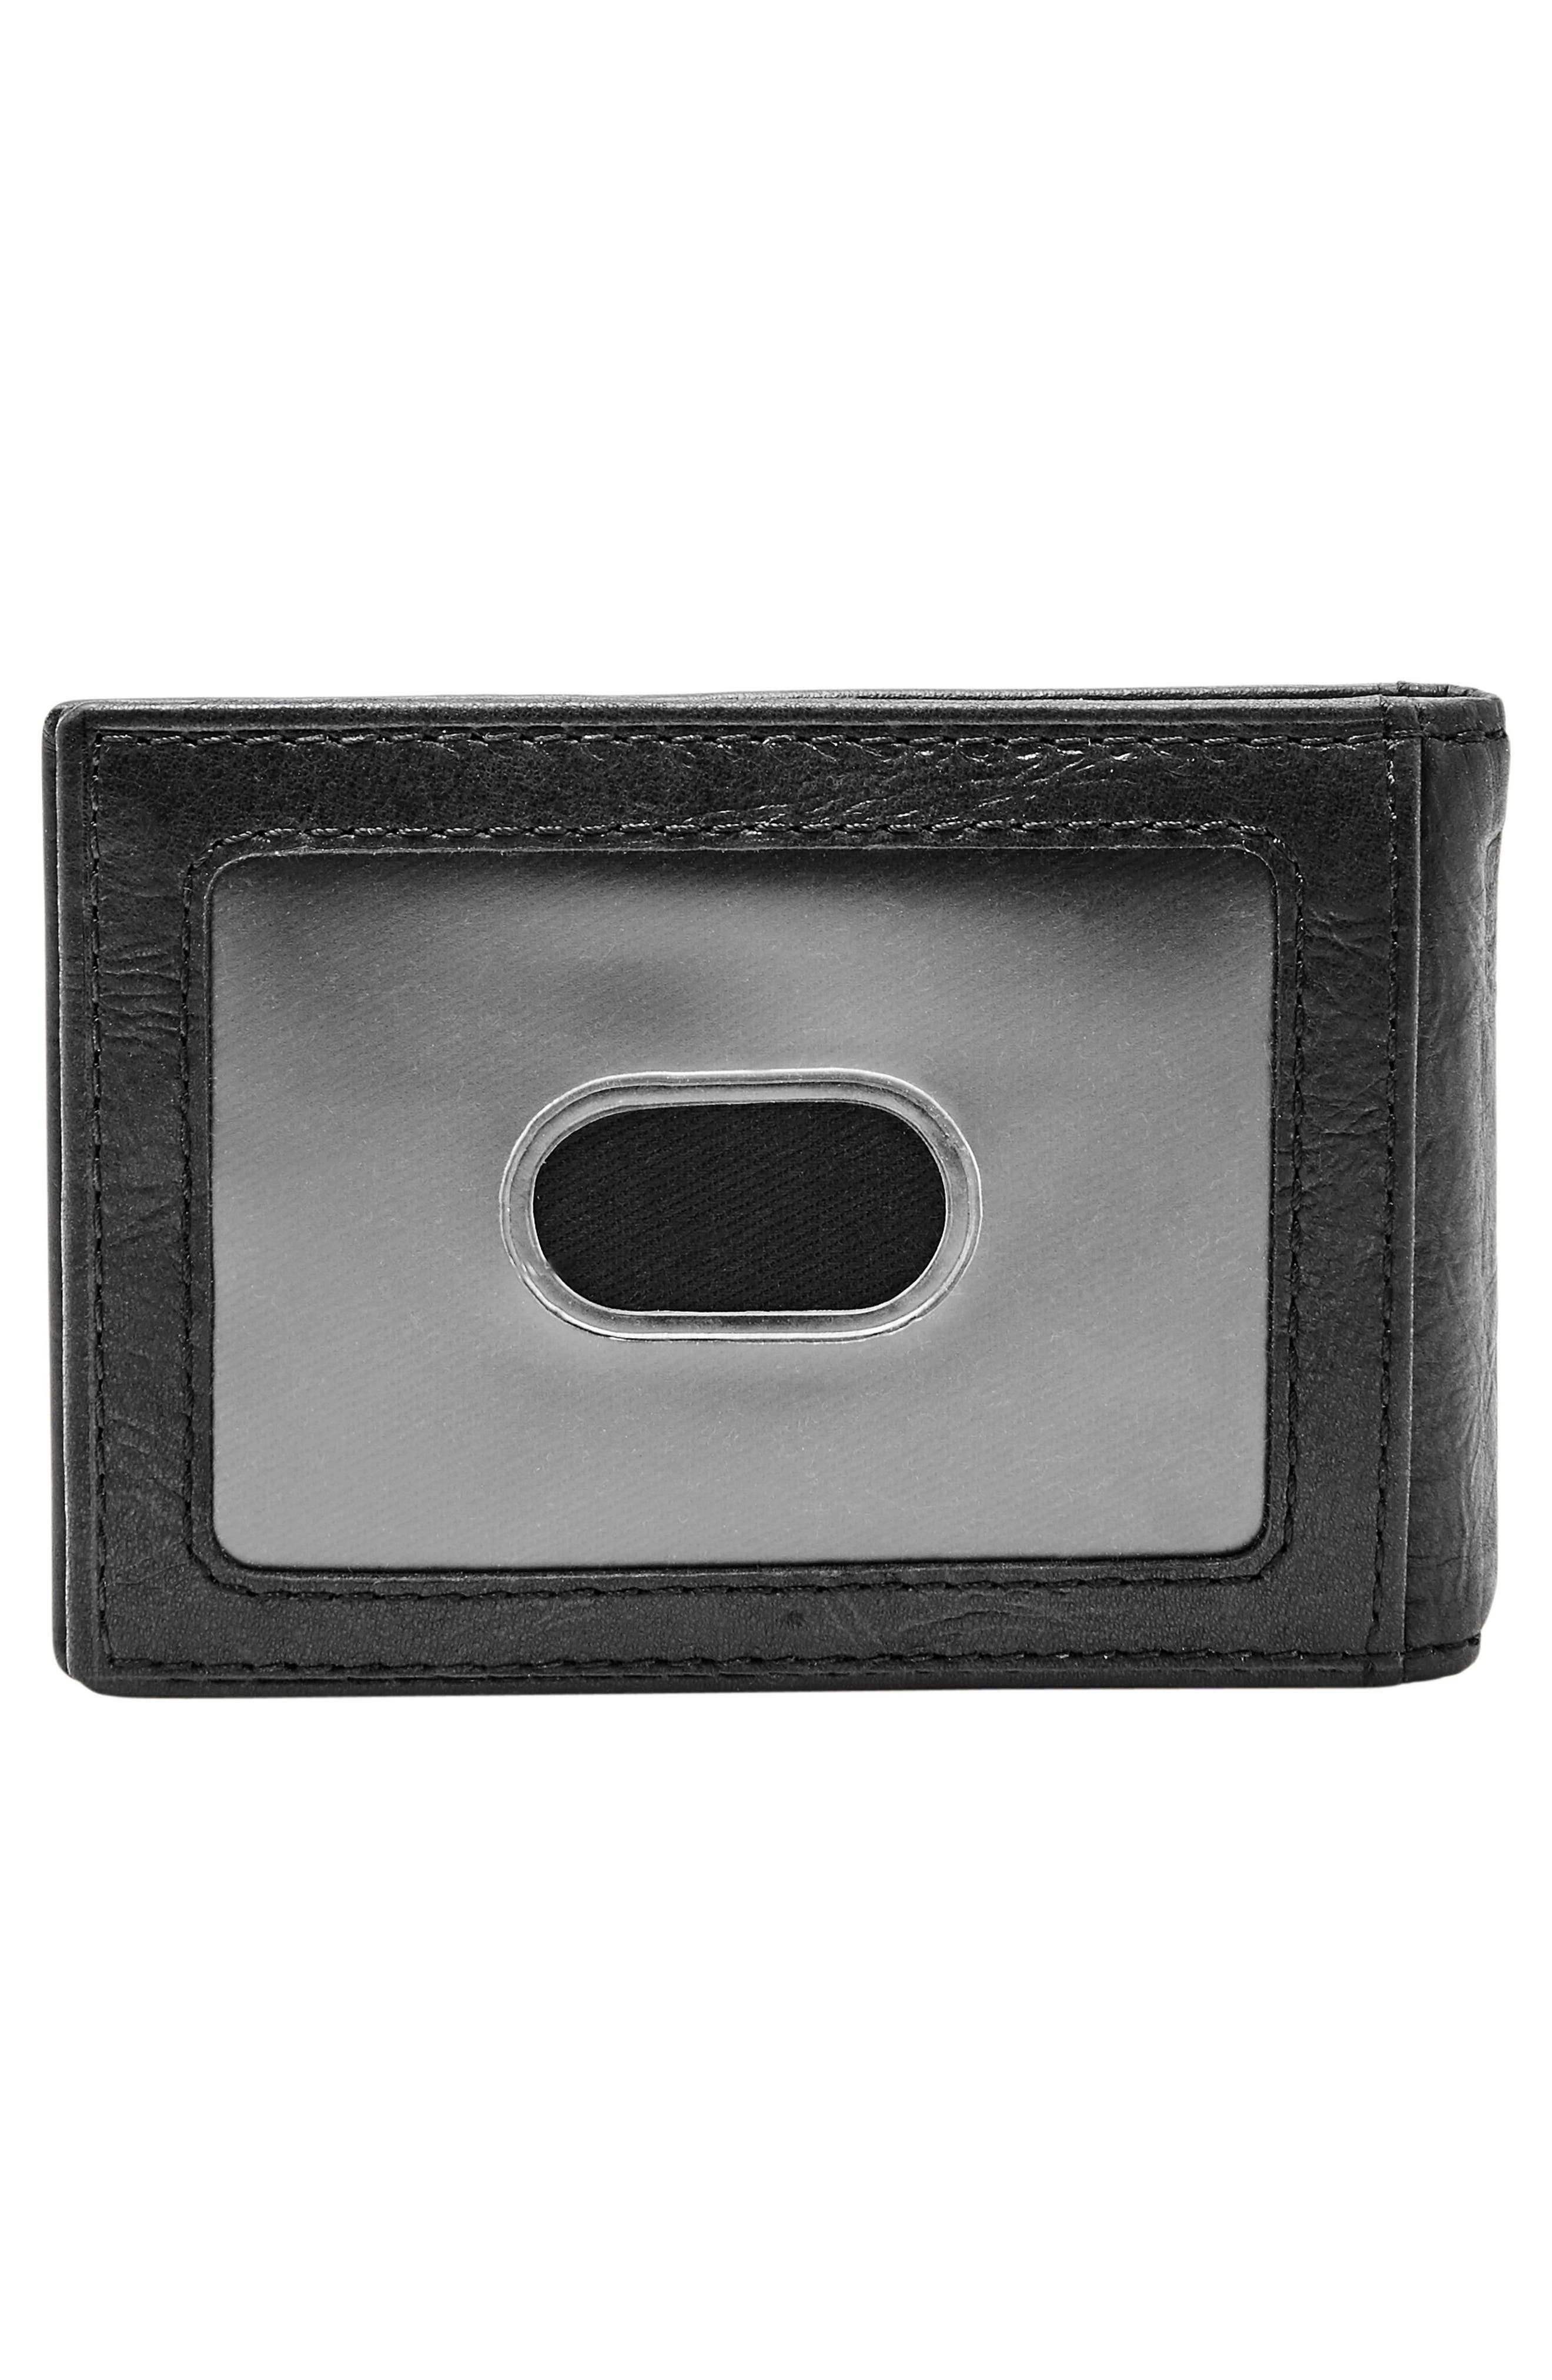 Alternate Image 3  - Fossil Neel Leather Money Clip Wallet